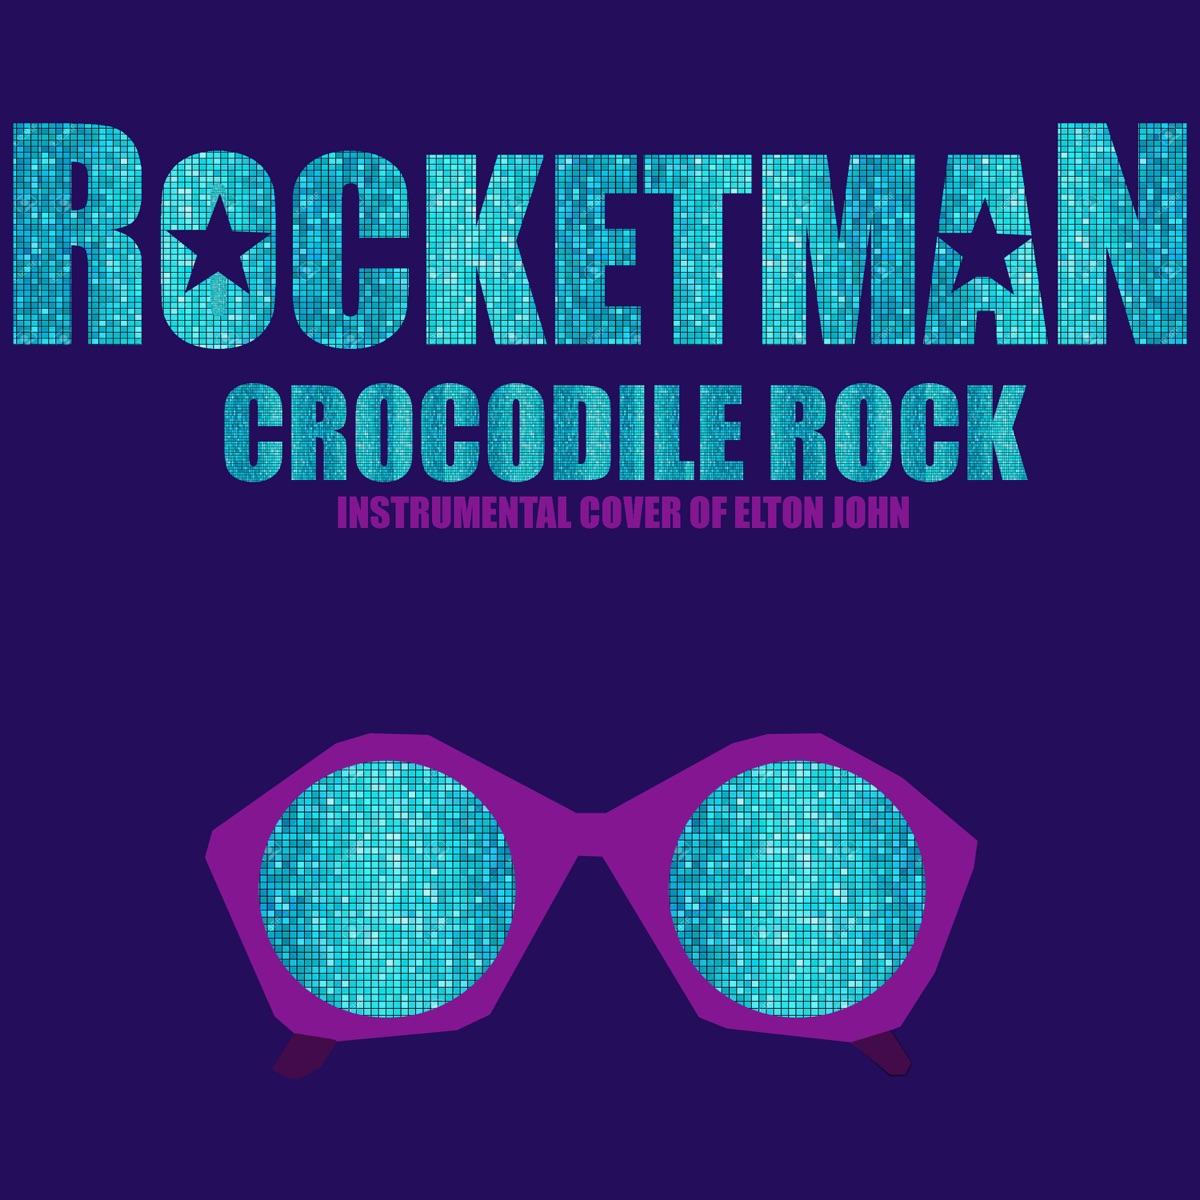 Crocodile Rock From Rocketman Instrumental Cover of Elton John - Single Rocket Man CD cover